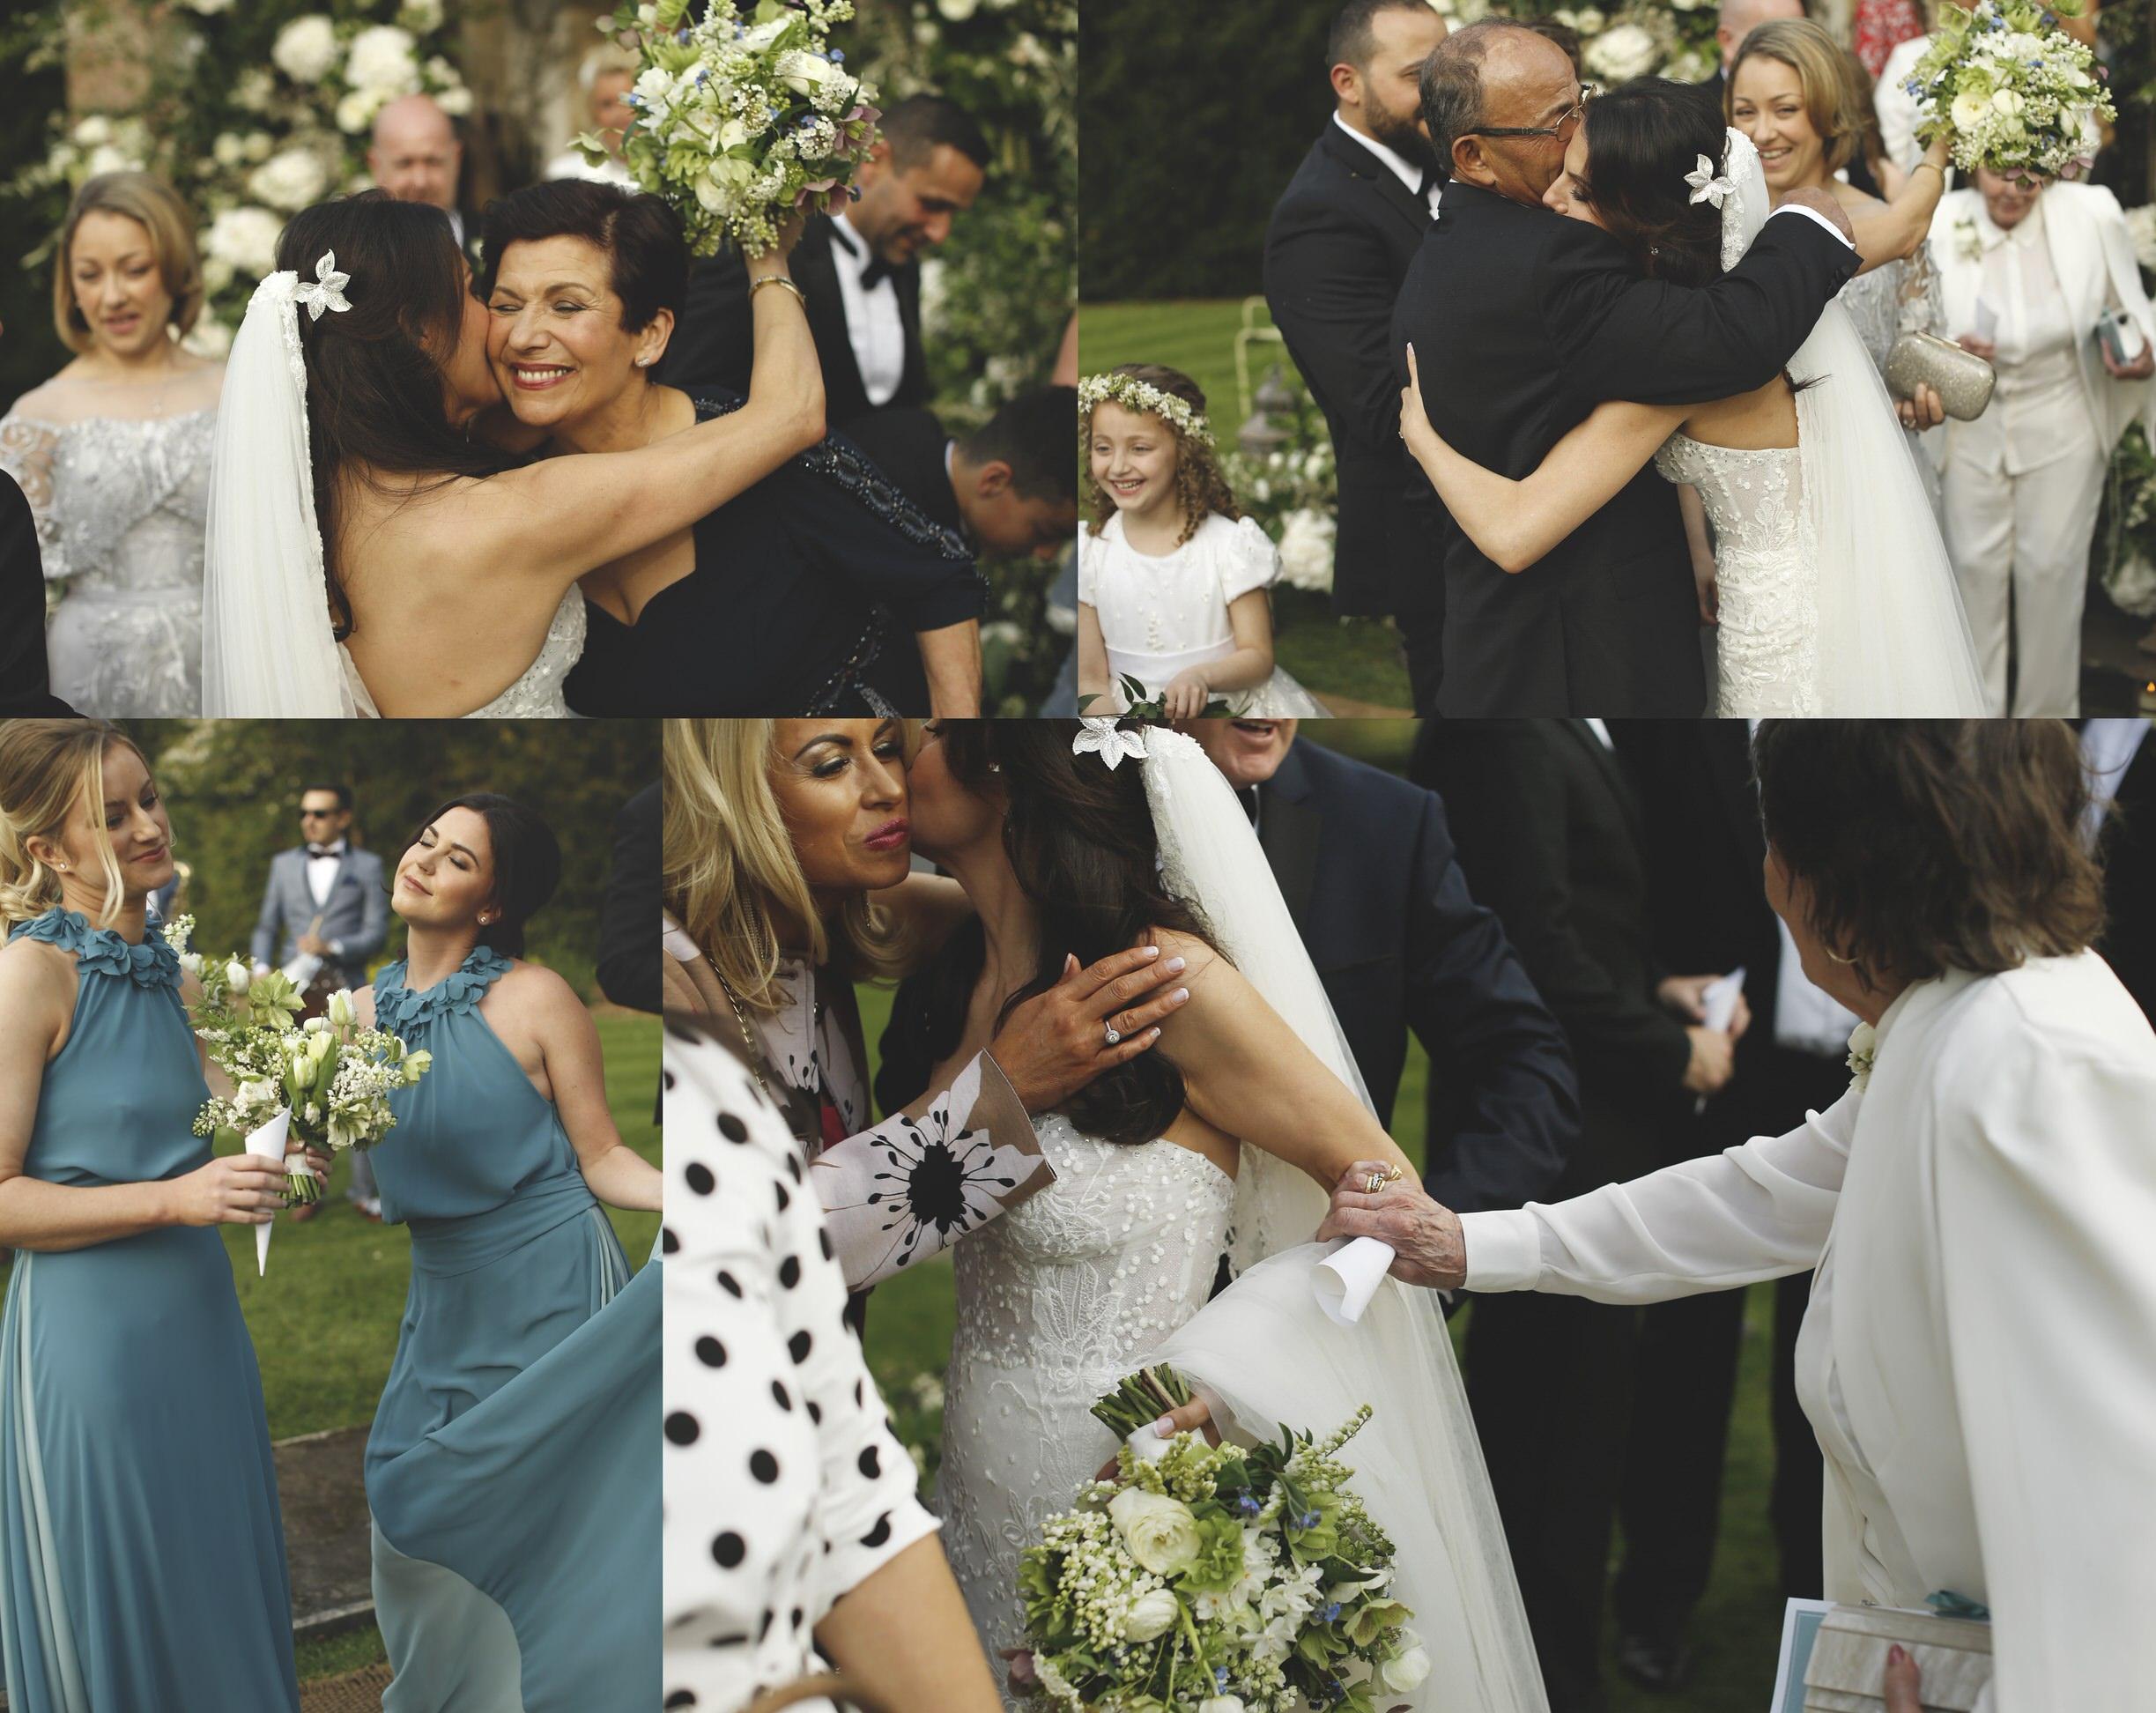 brettharkness-luxury-wedding-photographer-uk_0032.jpg